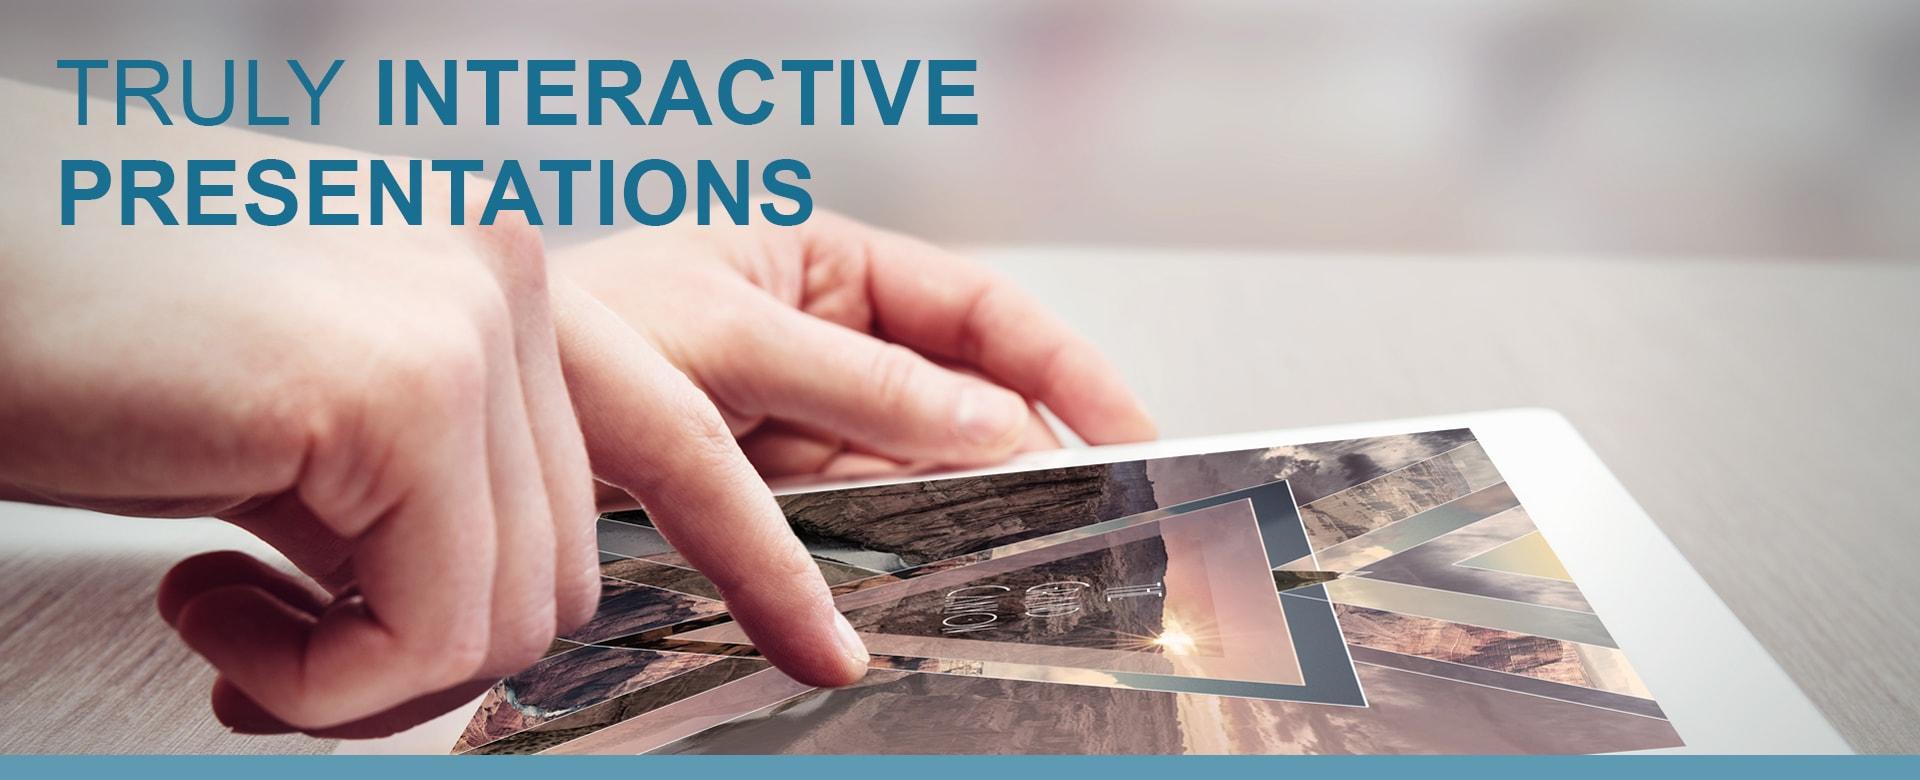 Interactive-slide-image-01-min